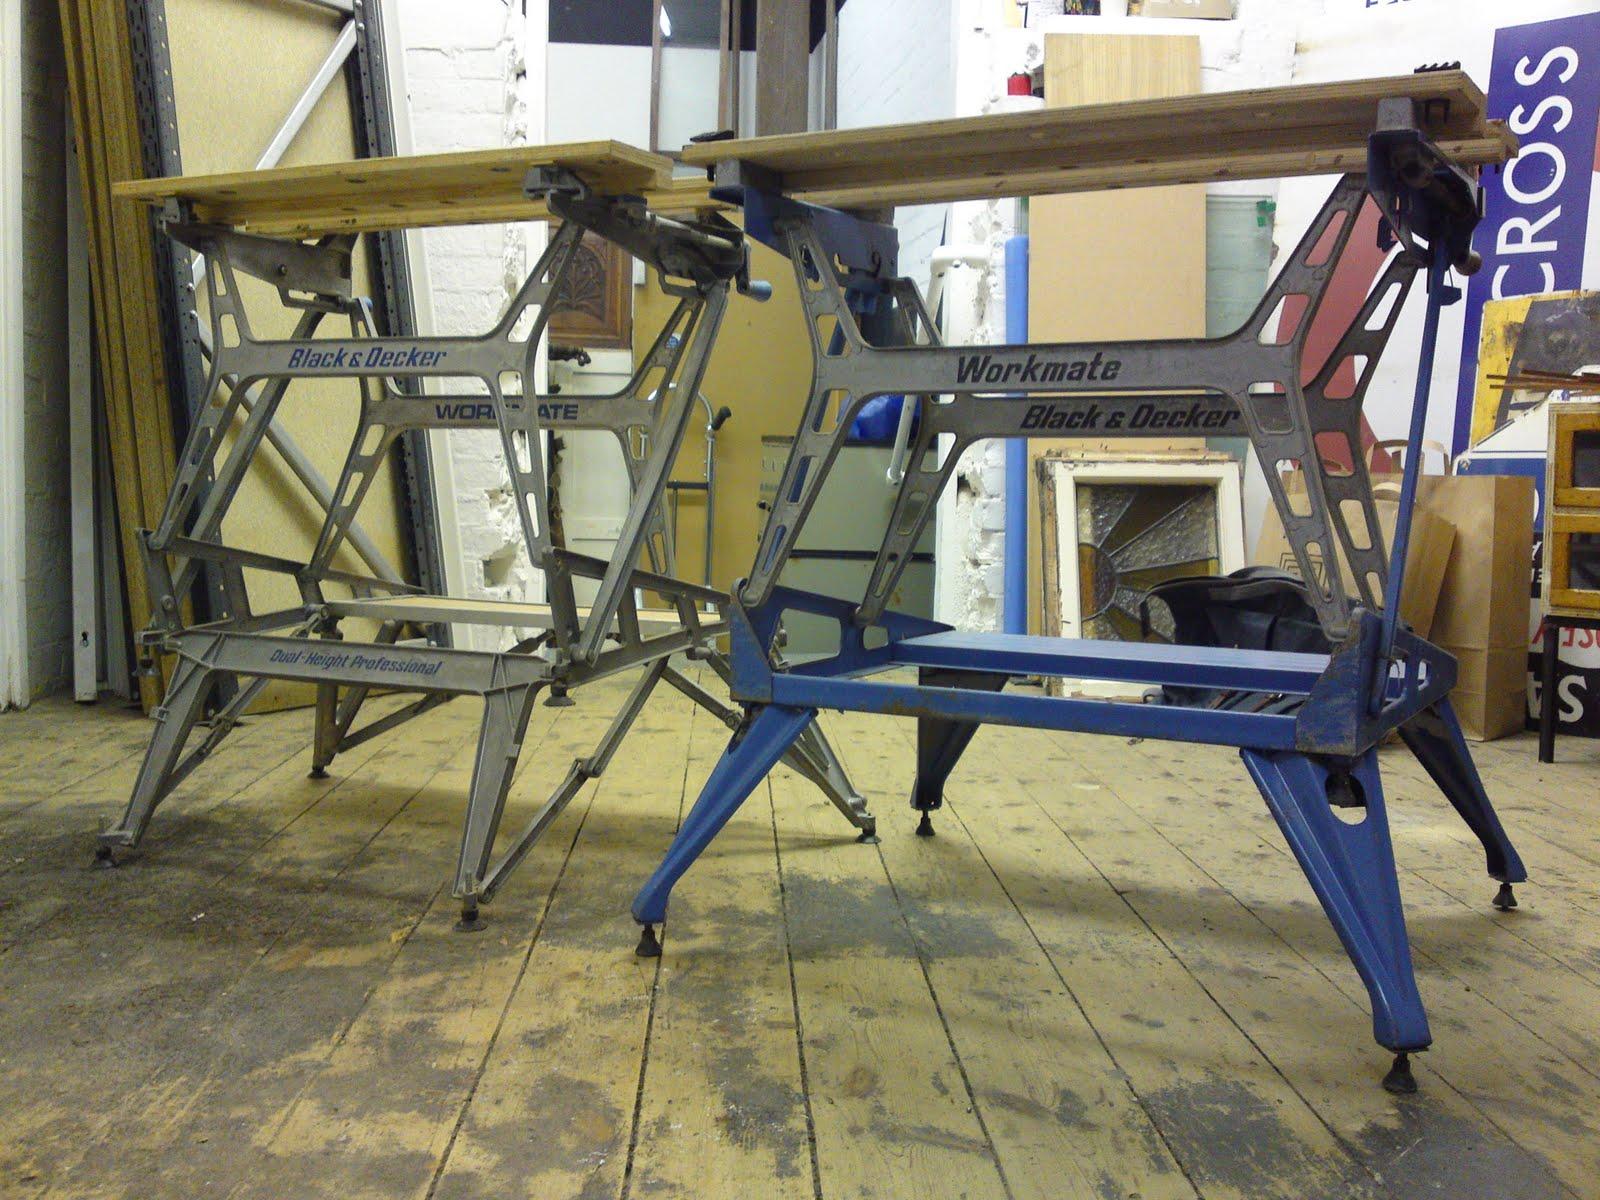 Styling and salvage vintage black decker workmate wm